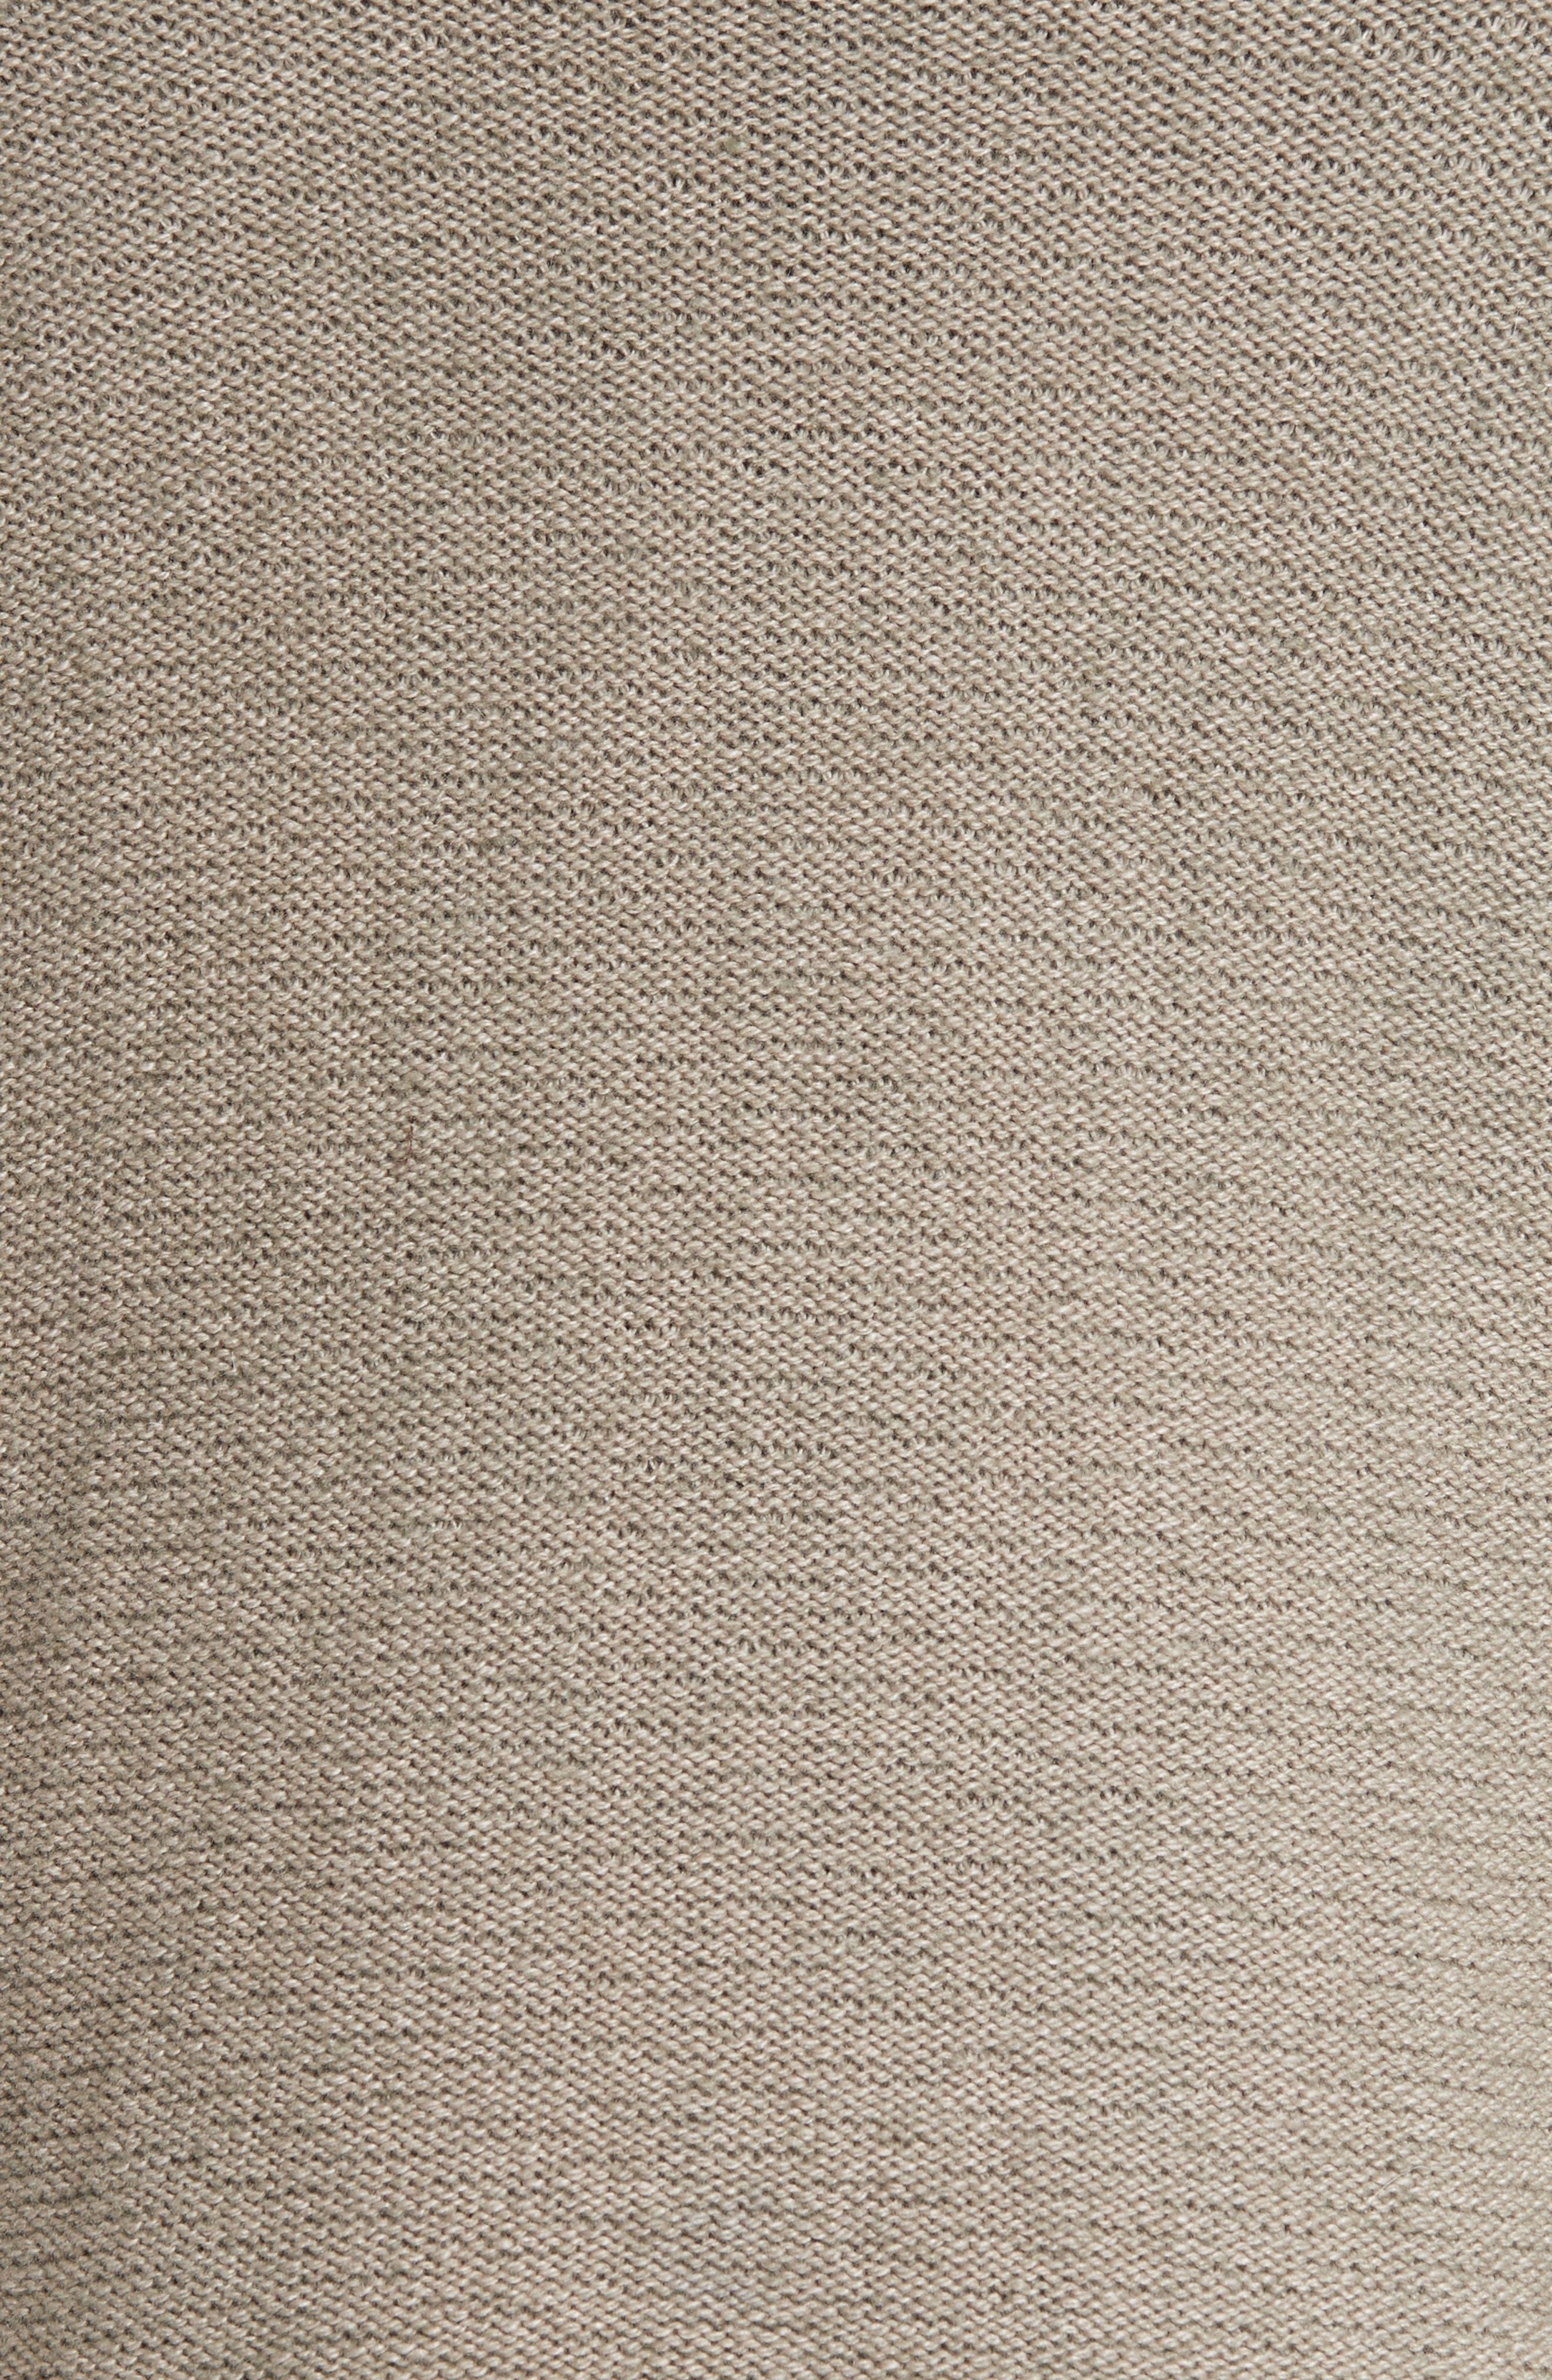 Napoli Slub Cashmere Sweater,                             Alternate thumbnail 5, color,                             200